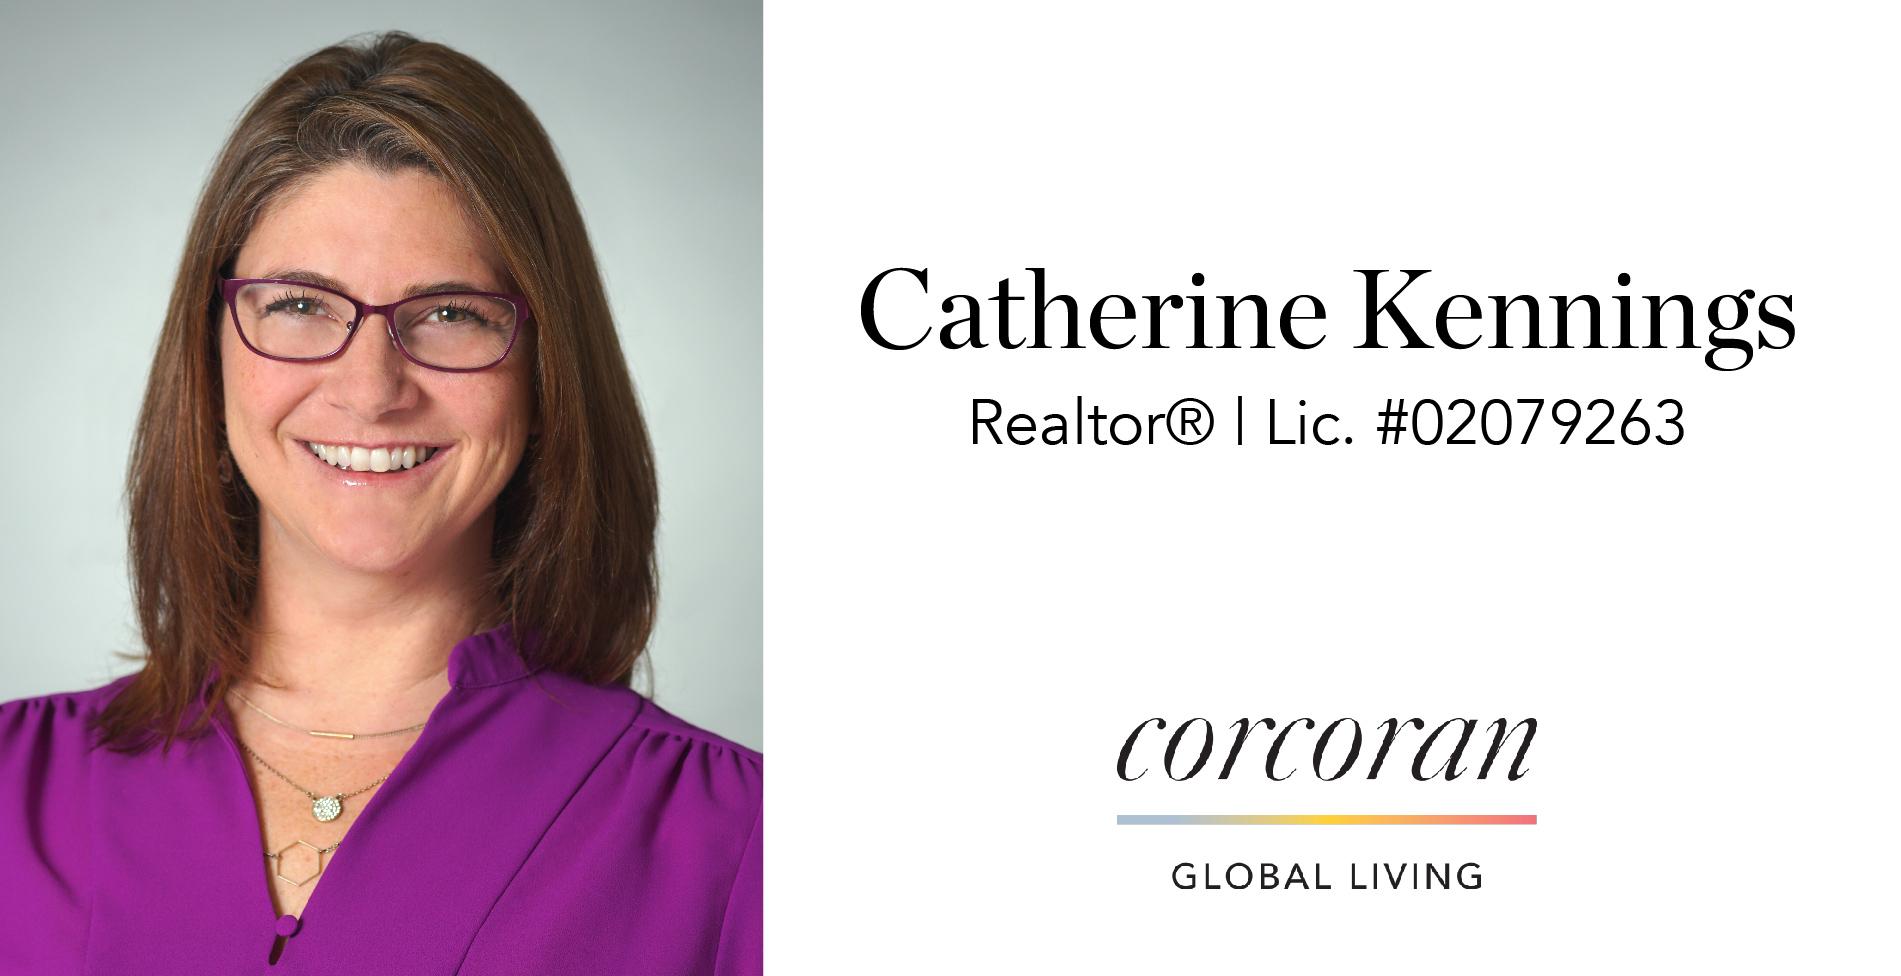 Catherine Kennings Real Estate